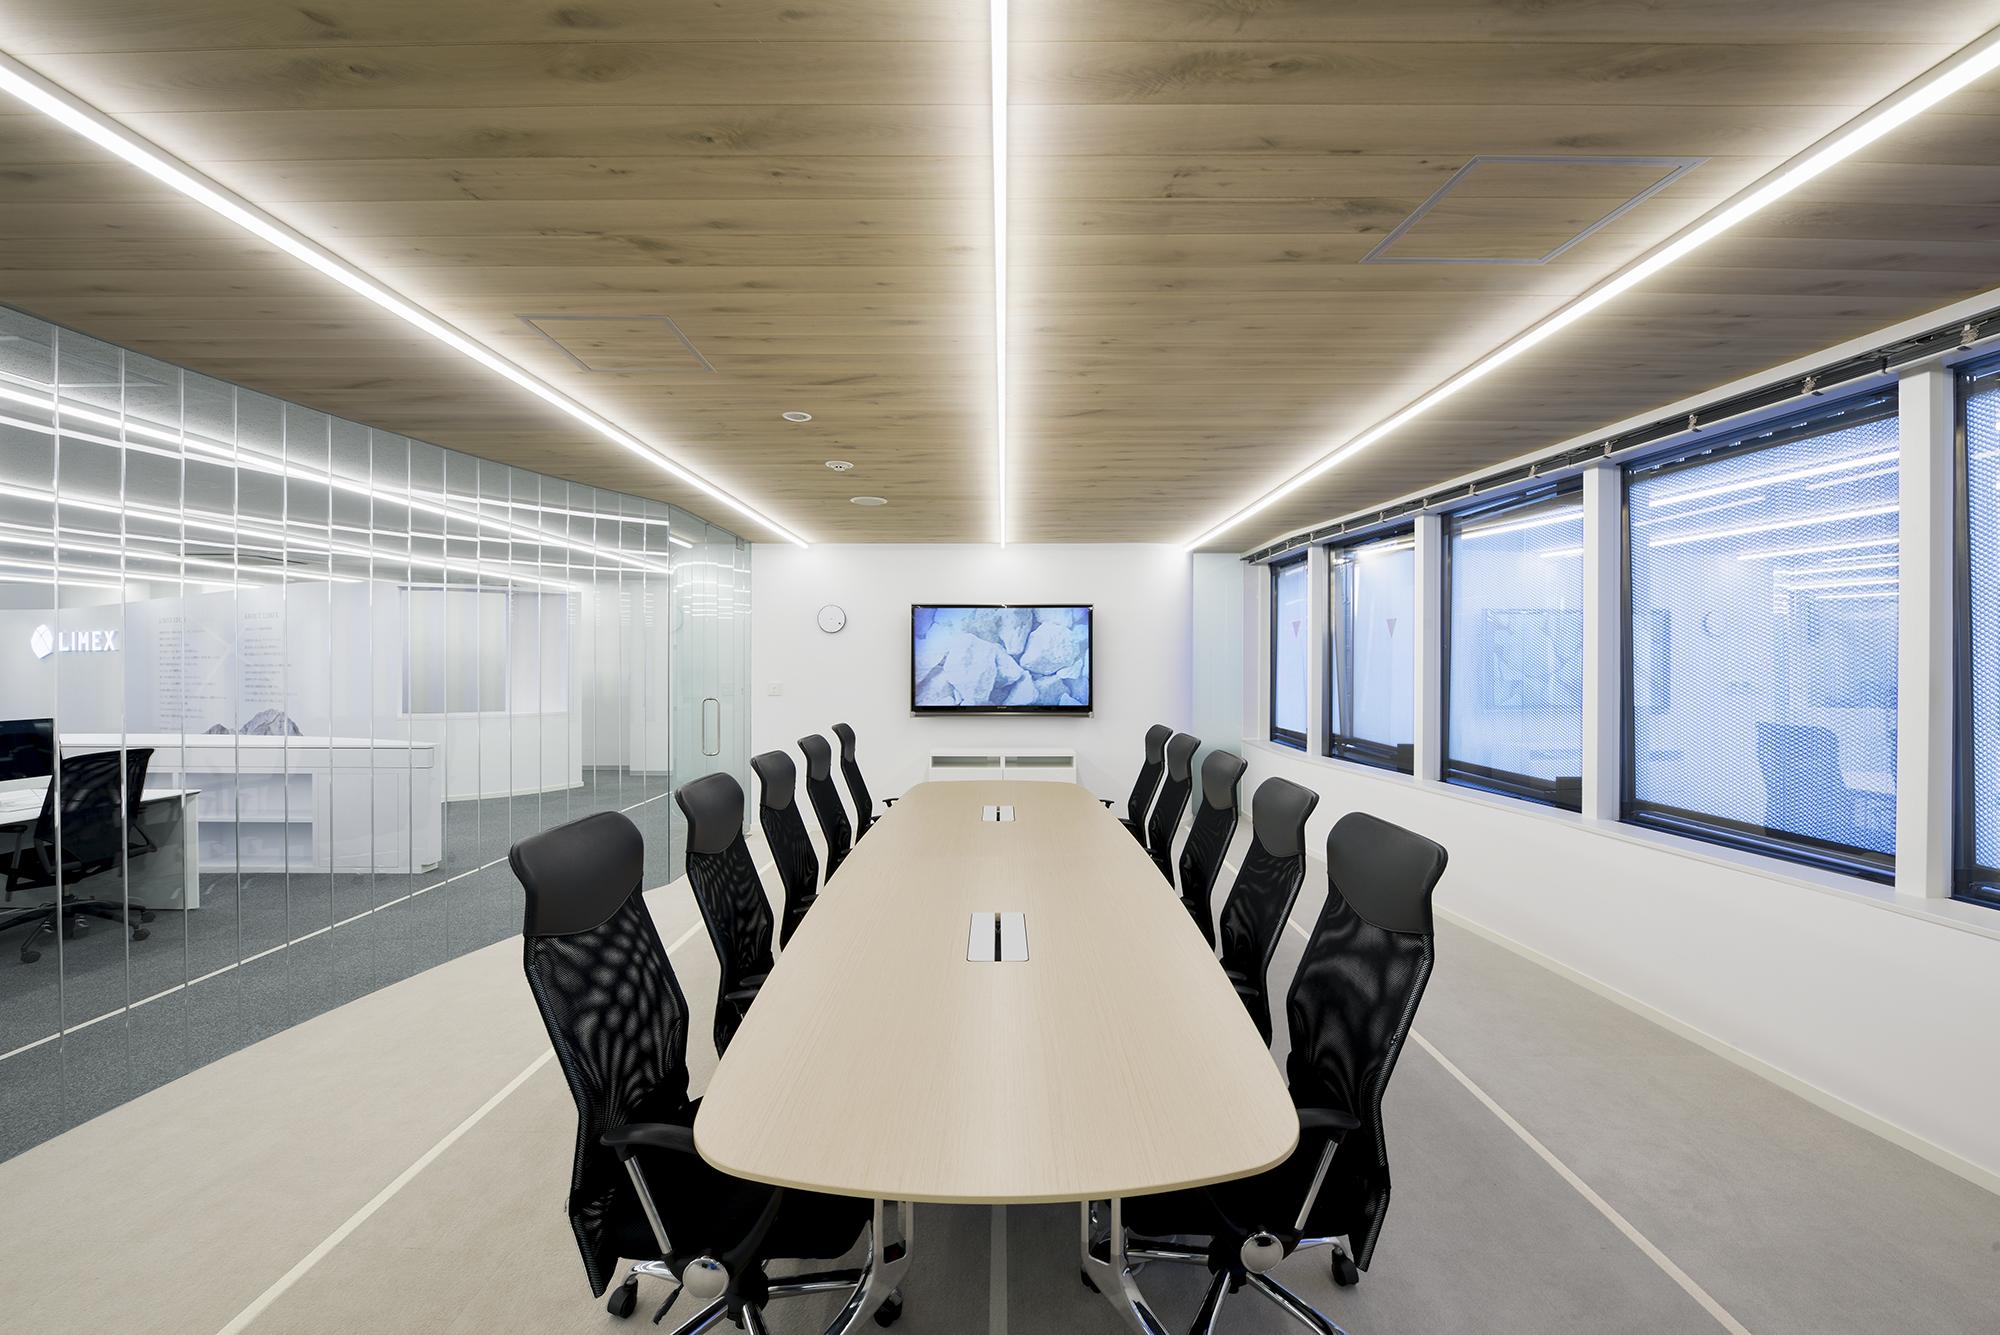 Design Architect: Clouds Architecture Office Project Designers: Masayuki  Sono, Ostap Rudakevych Executive Architect: Miyazaki Architects And  Associates